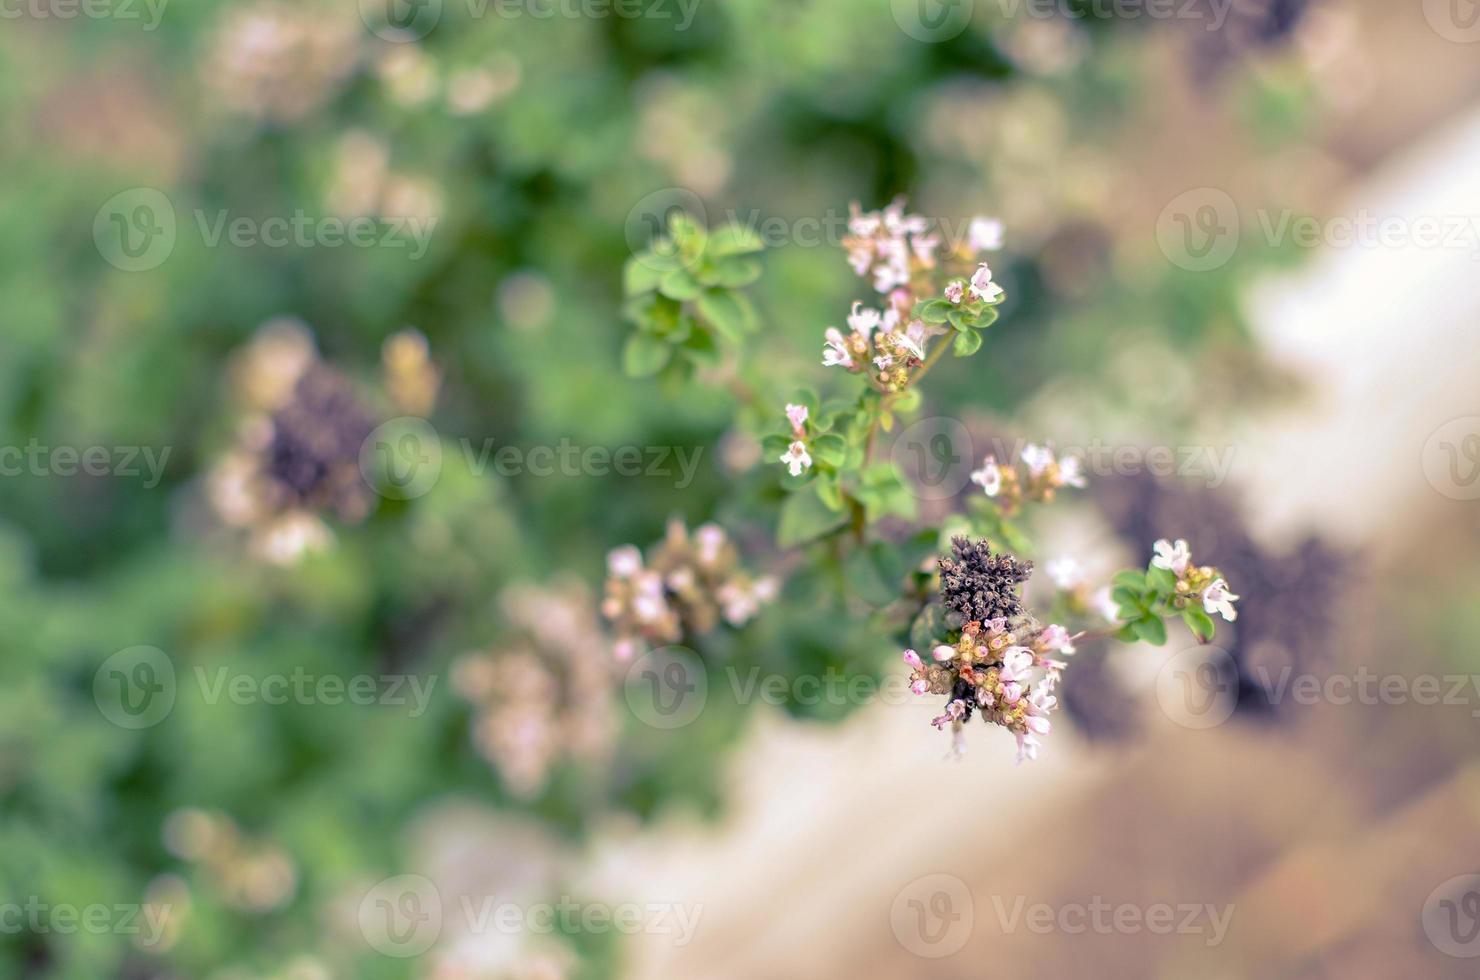 thymus serpyllum fleurit dans le jardin, gros plan photo